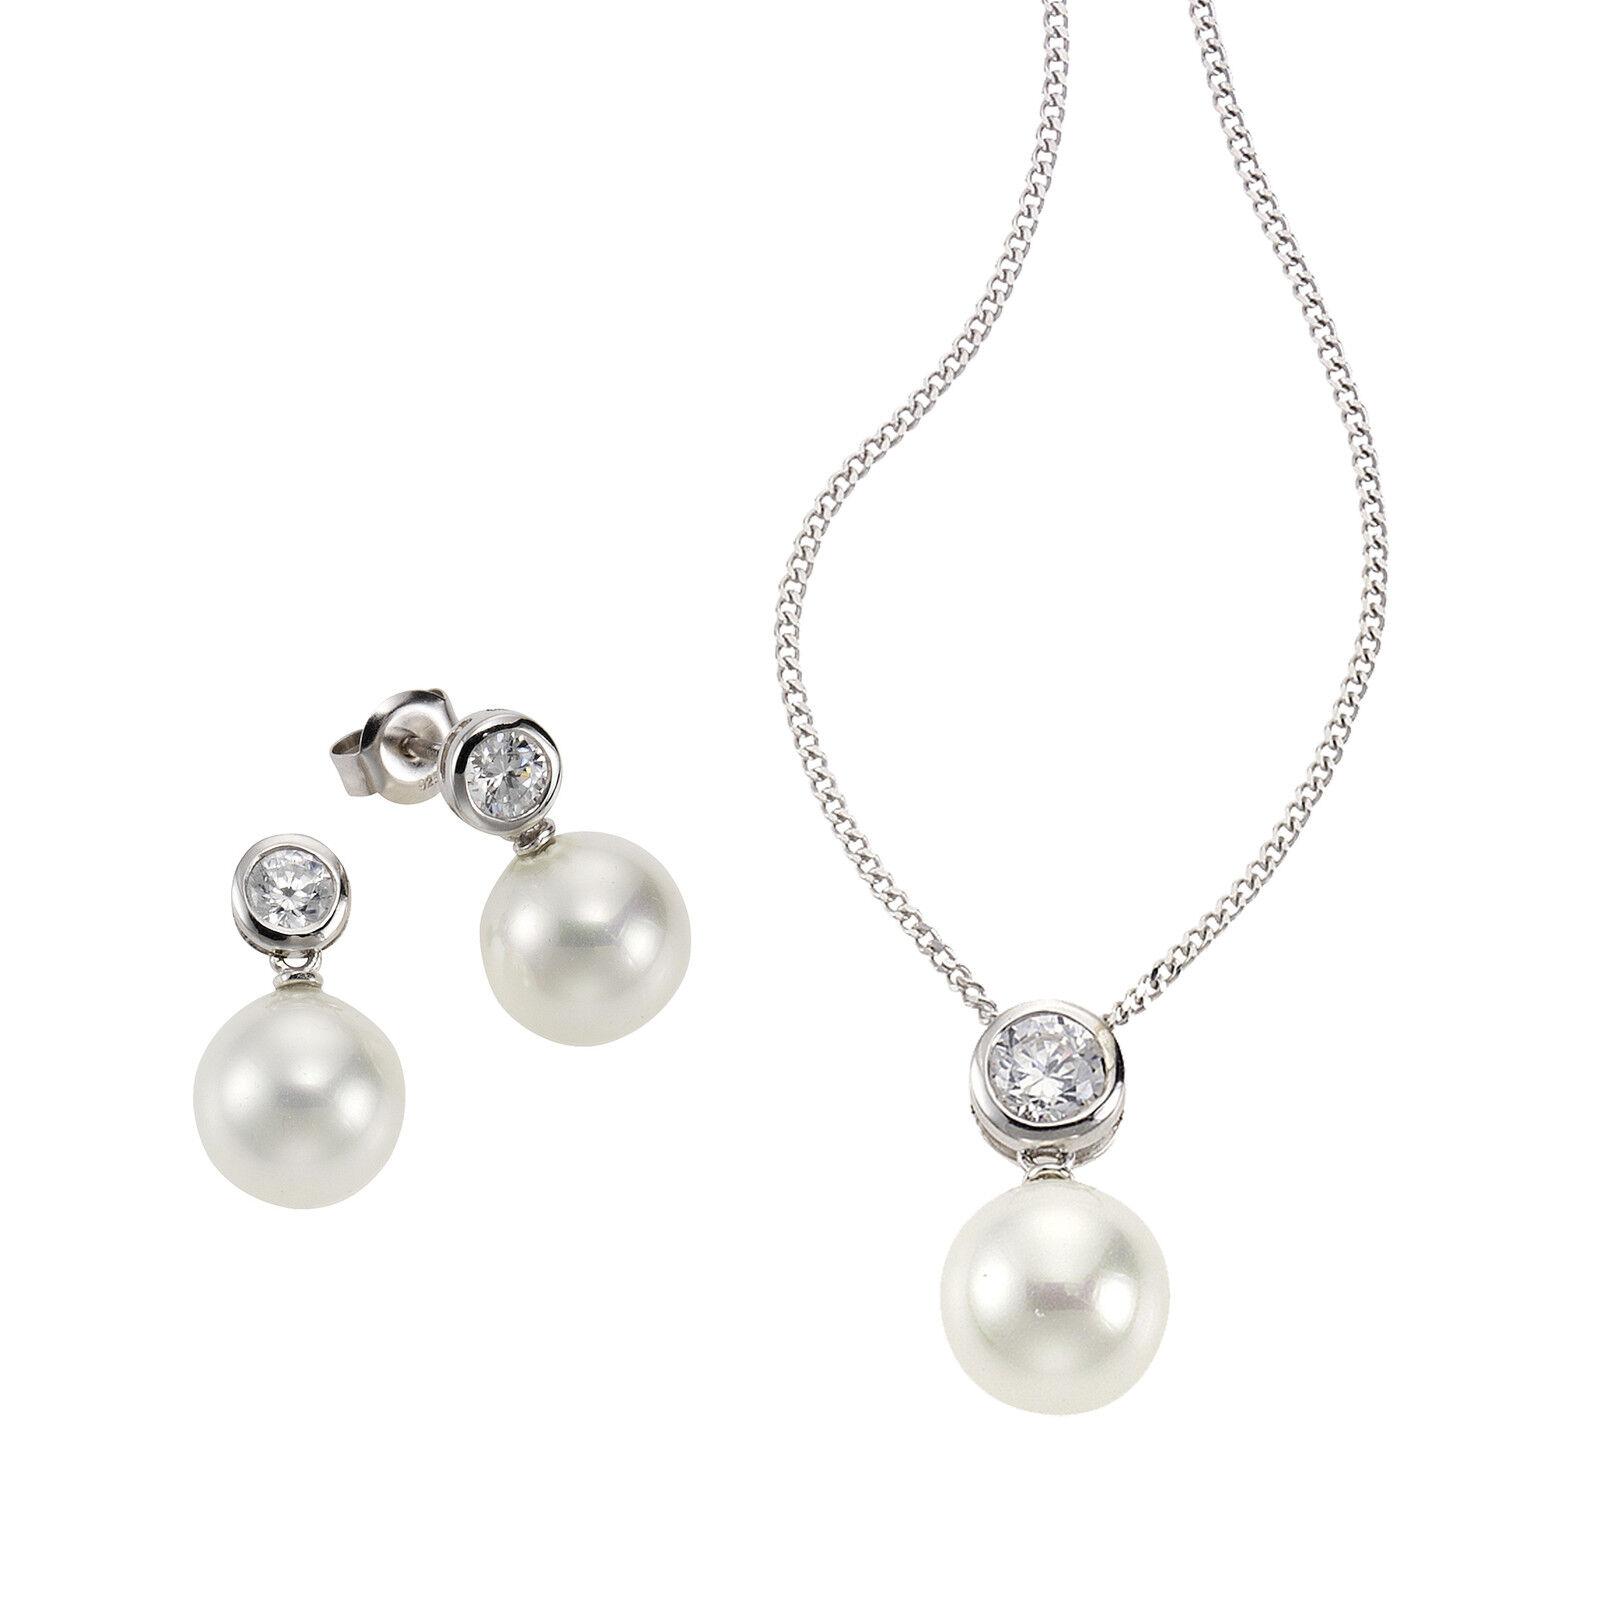 Celesta Set 925 Sterling Silber Zirkonia Perle Ohrring Stecker Kette Anhänger